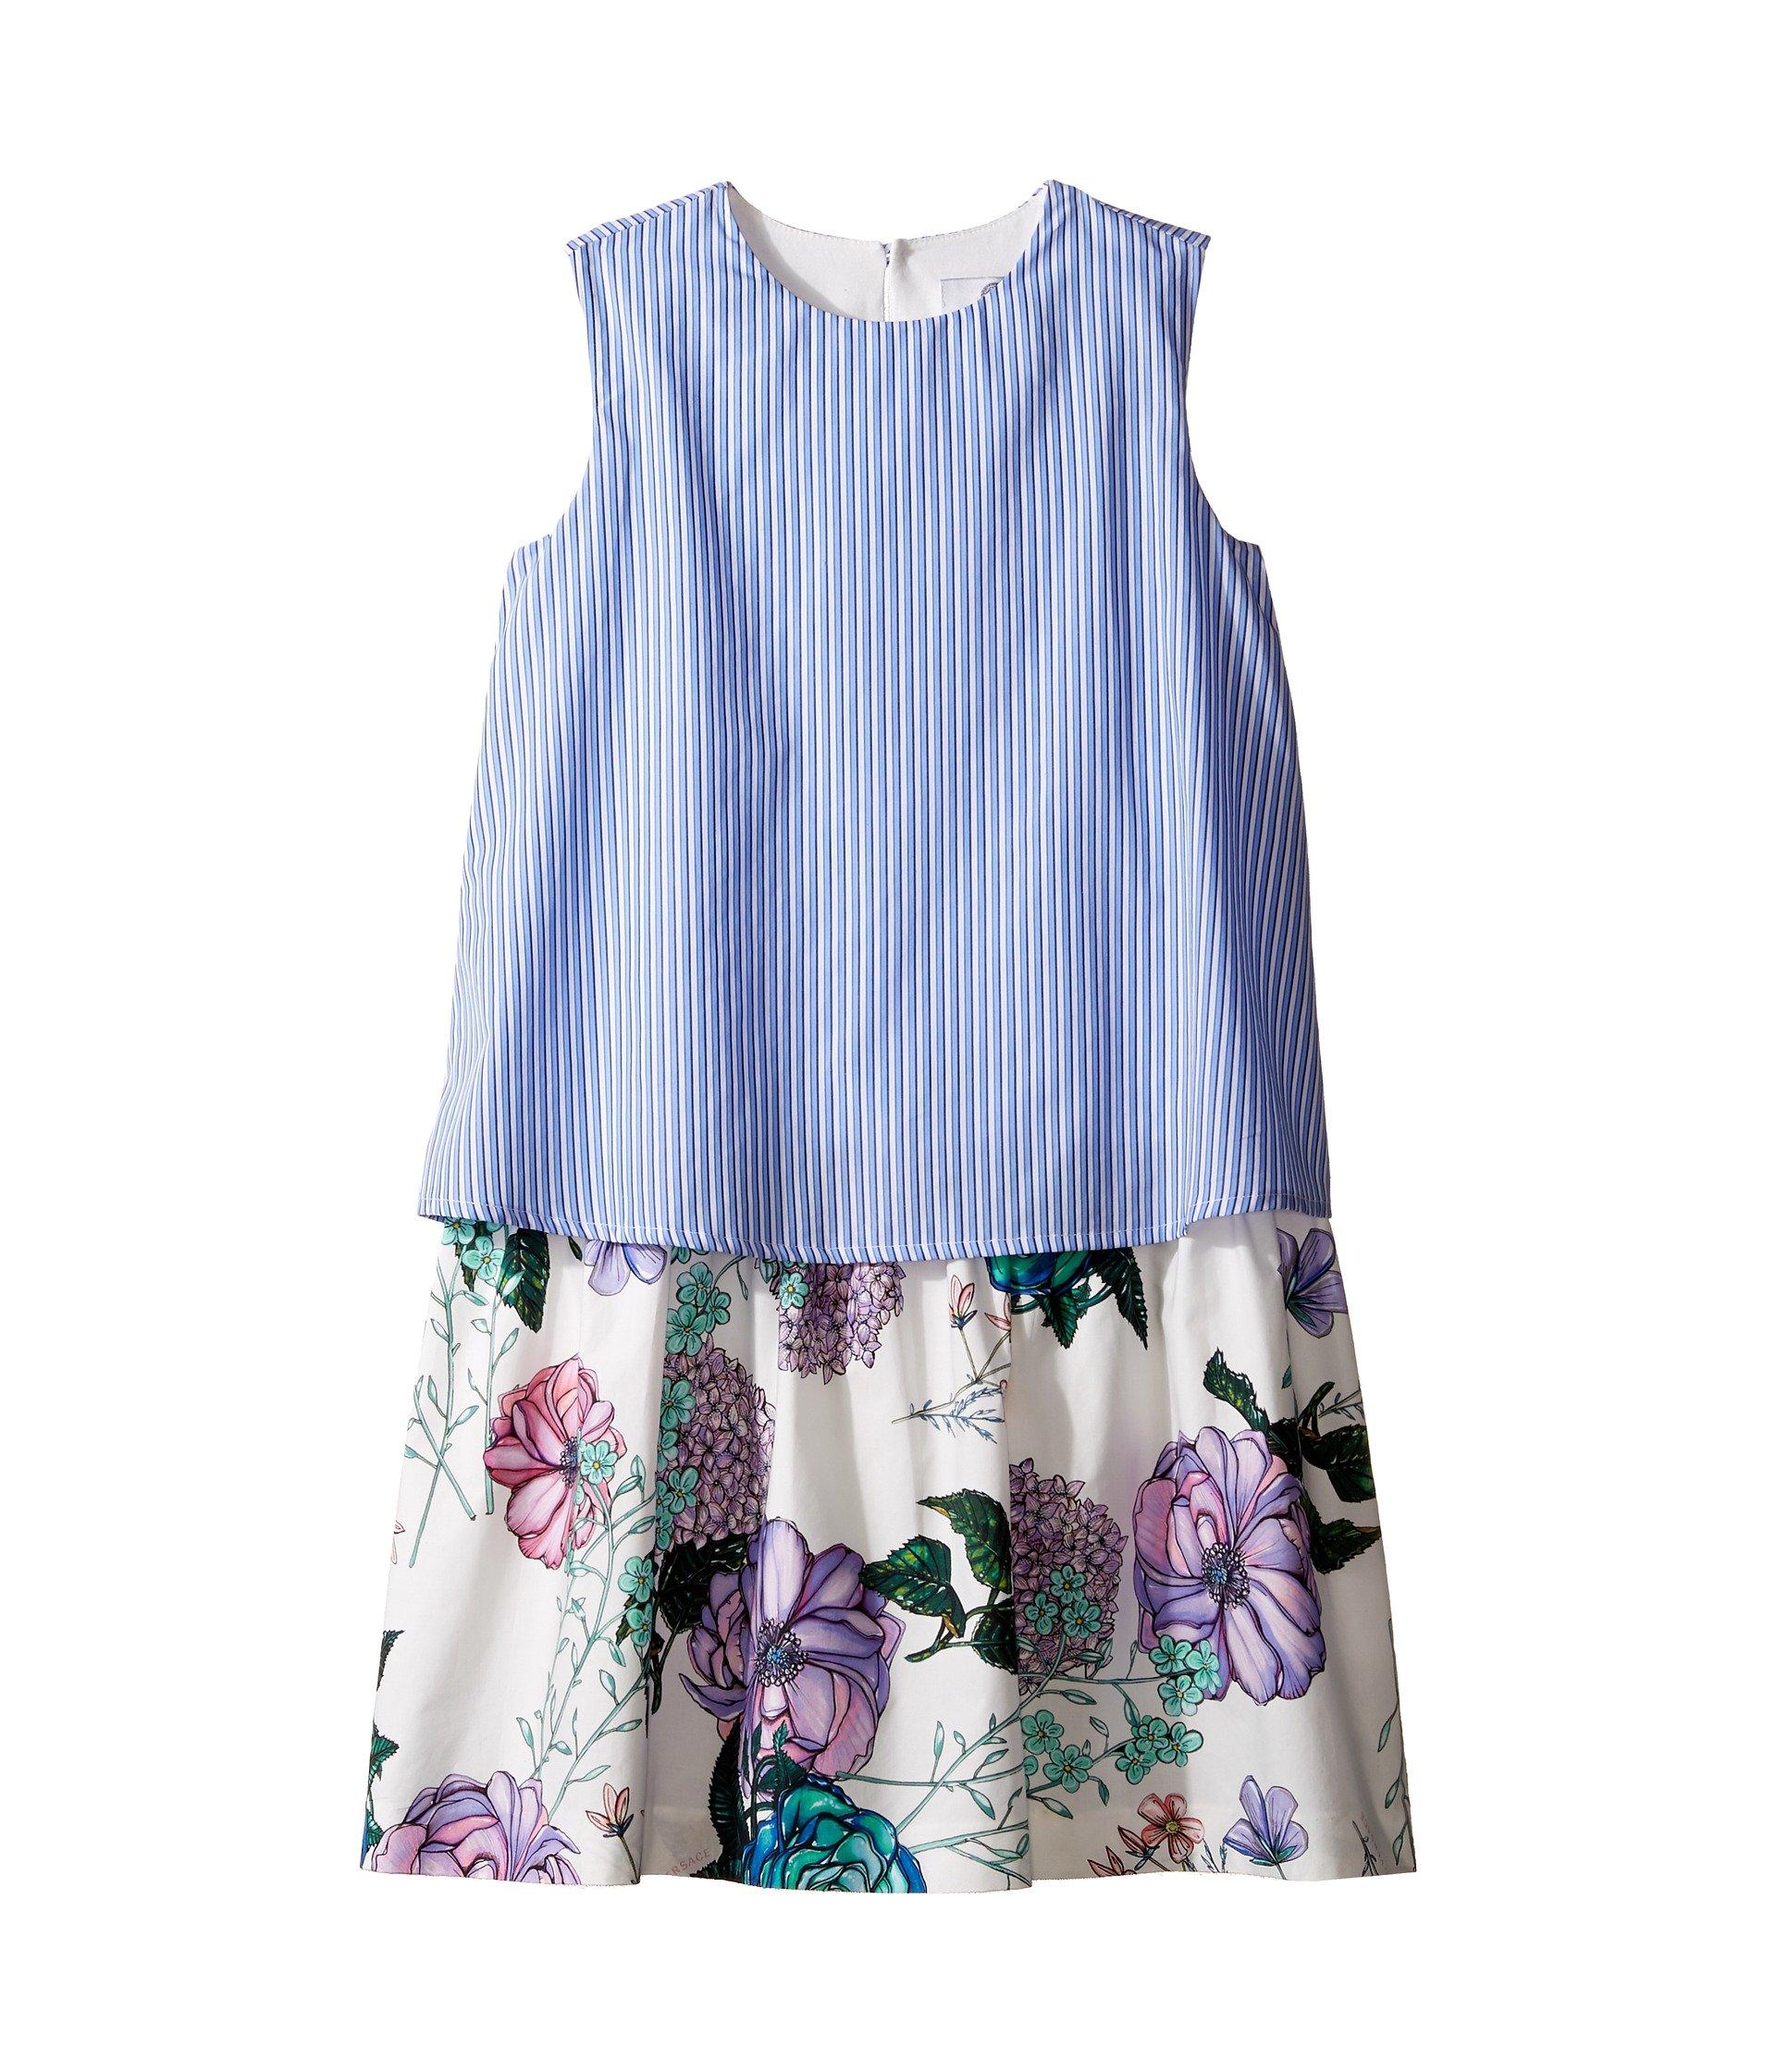 Vestido para Niña Versace Kids Layered Striped and Floral Print Dress (Big Kids)  + Versace en VeoyCompro.net